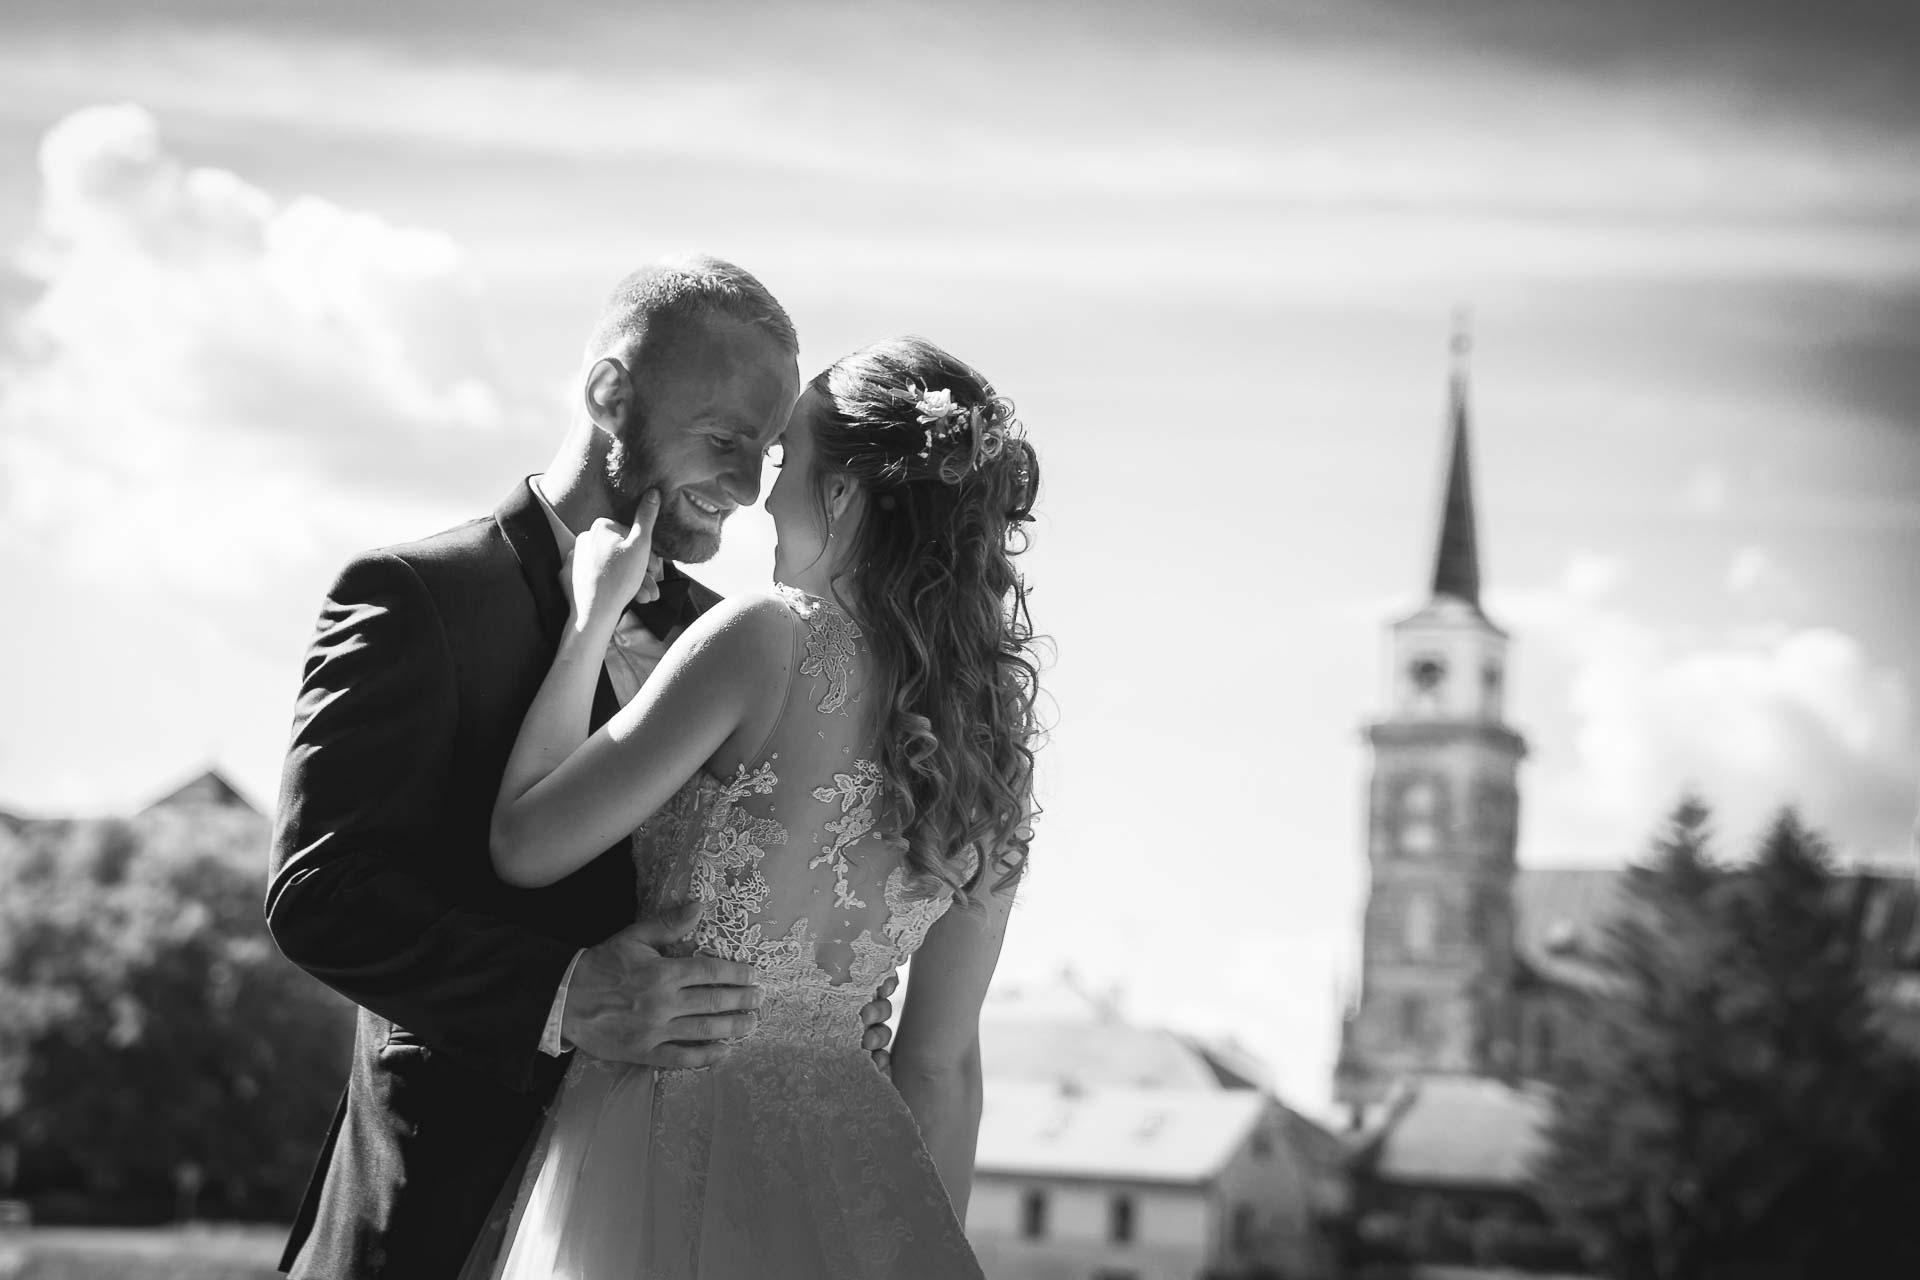 svatební-fotograf-svatebni-video-Nymburk-hotel-Ostrov-Beautyfoto-6172